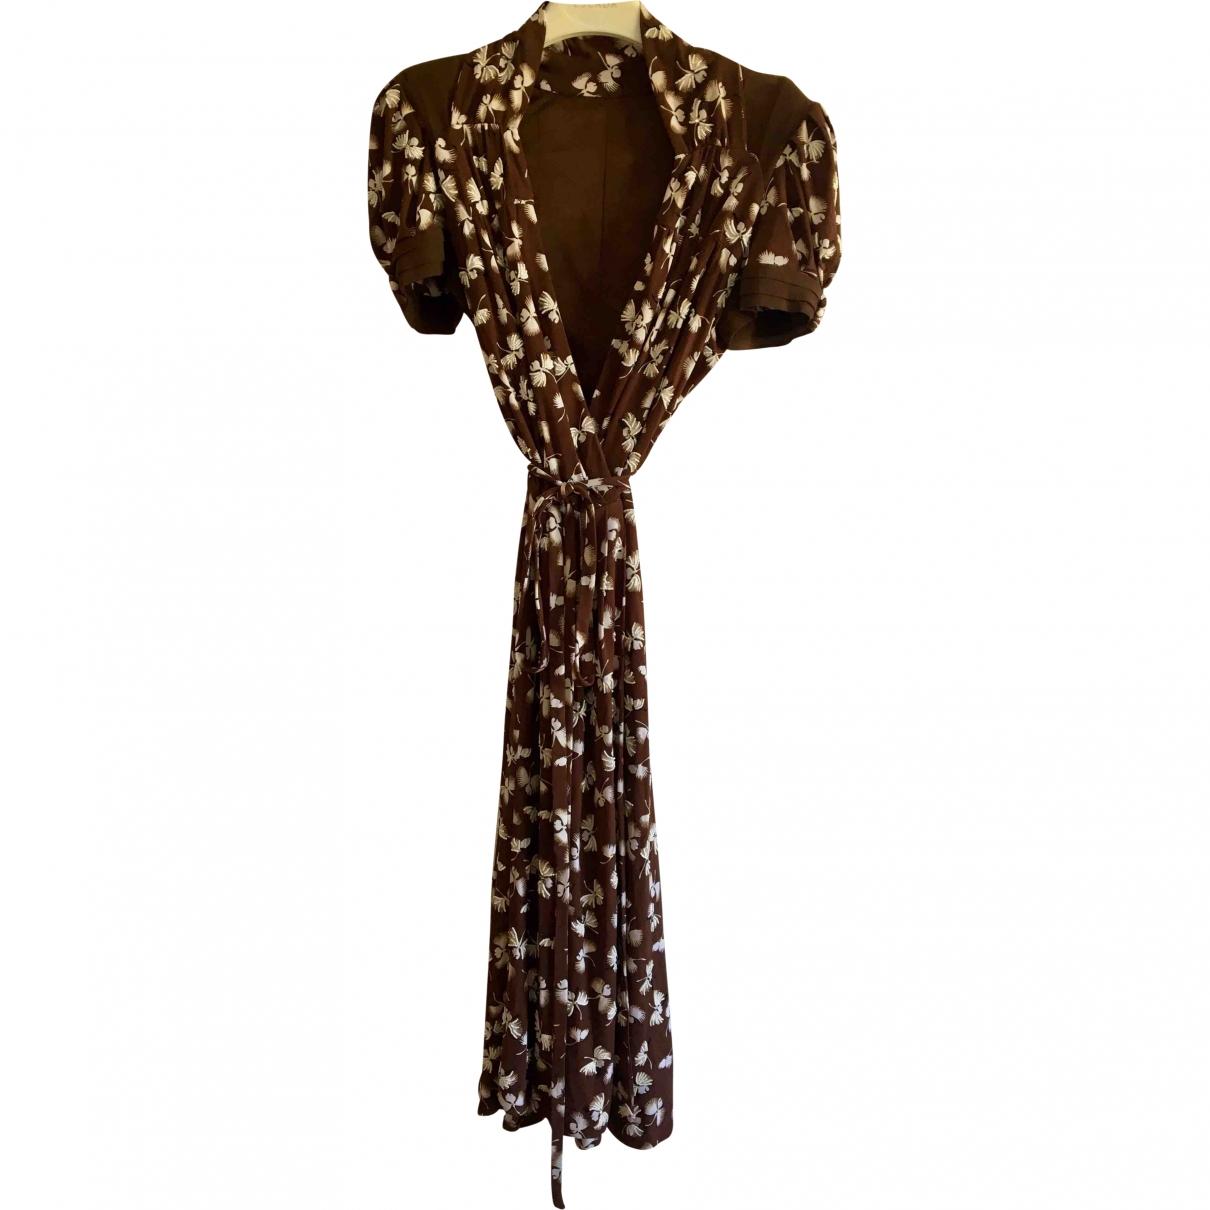 Gucci \N Brown Silk dress for Women 44 IT